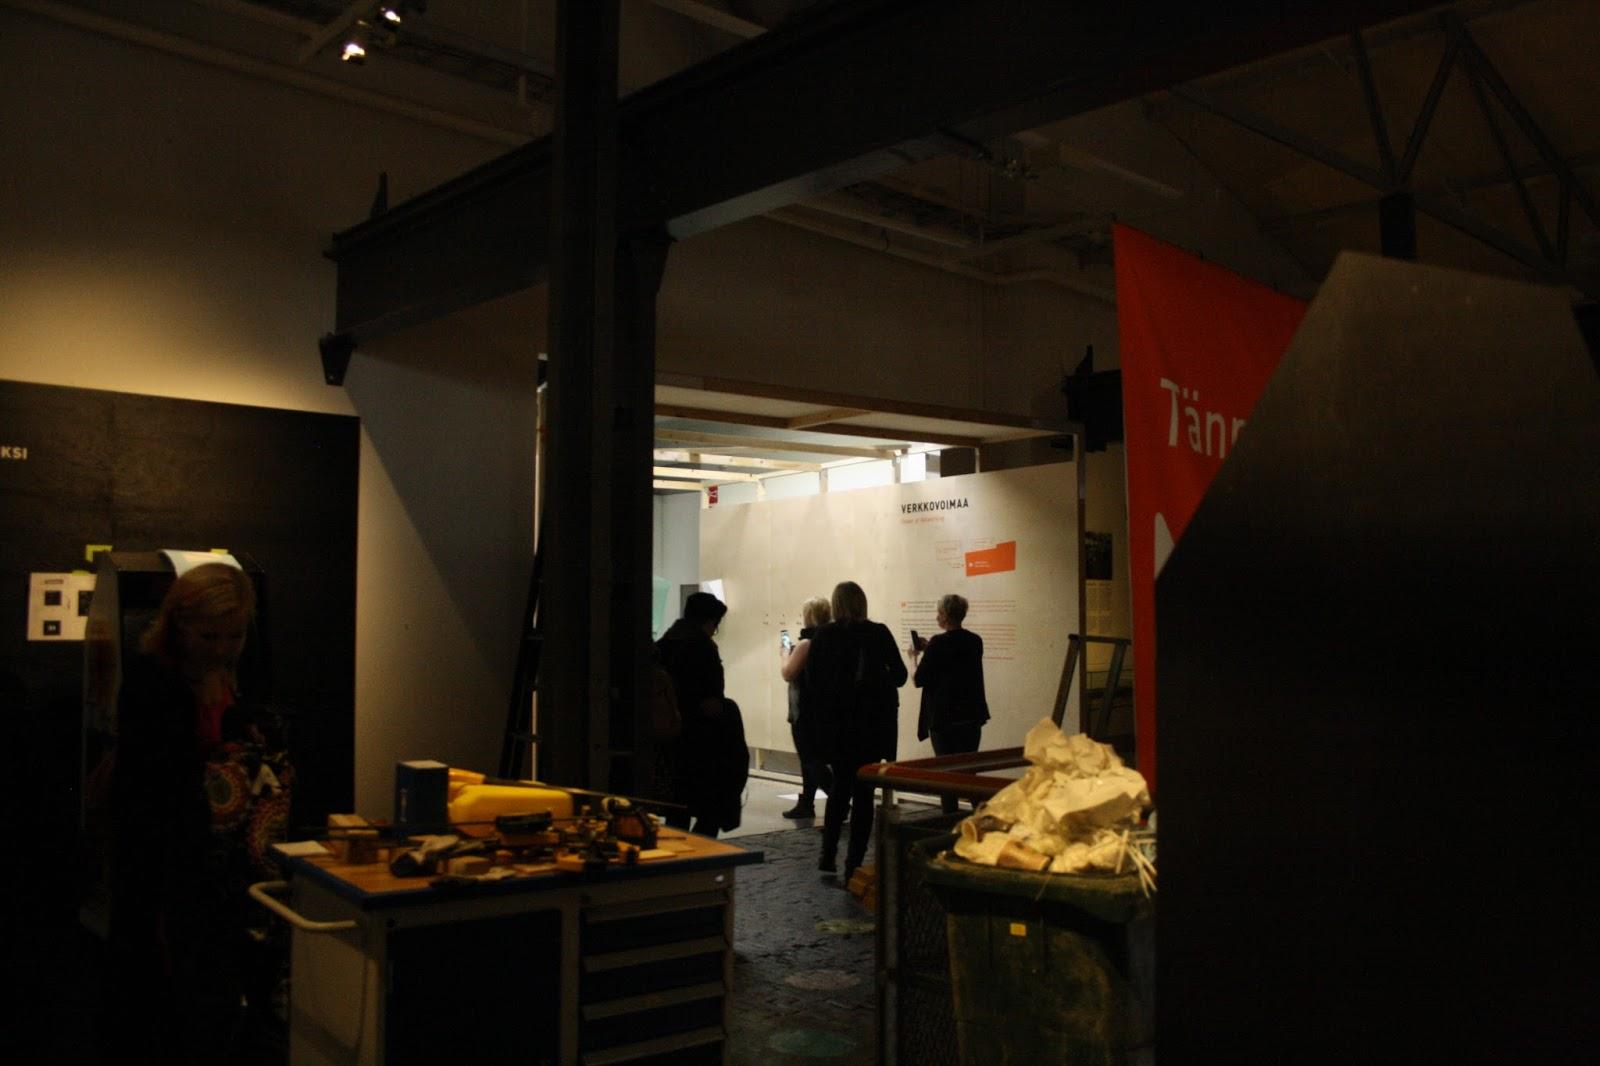 Museokeskus vapriikki, tampere, tampella, Mediamuseo Rupriikki